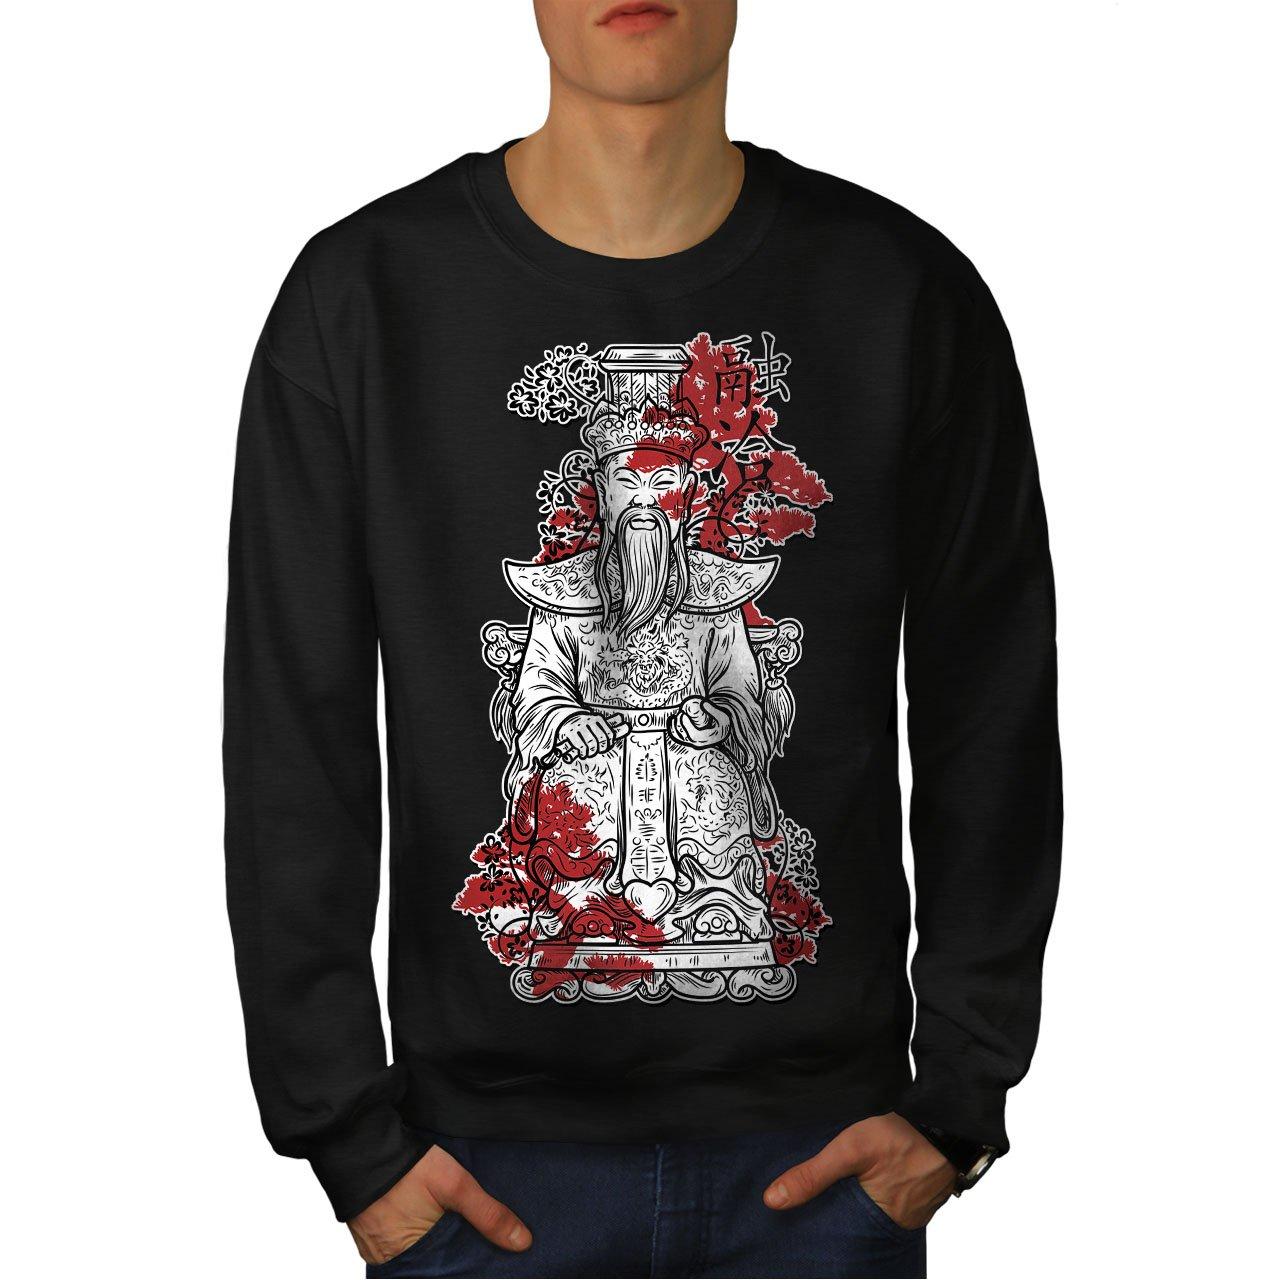 wellcoda Japanese King Art Mens Sweatshirt Empire Casual Jumper